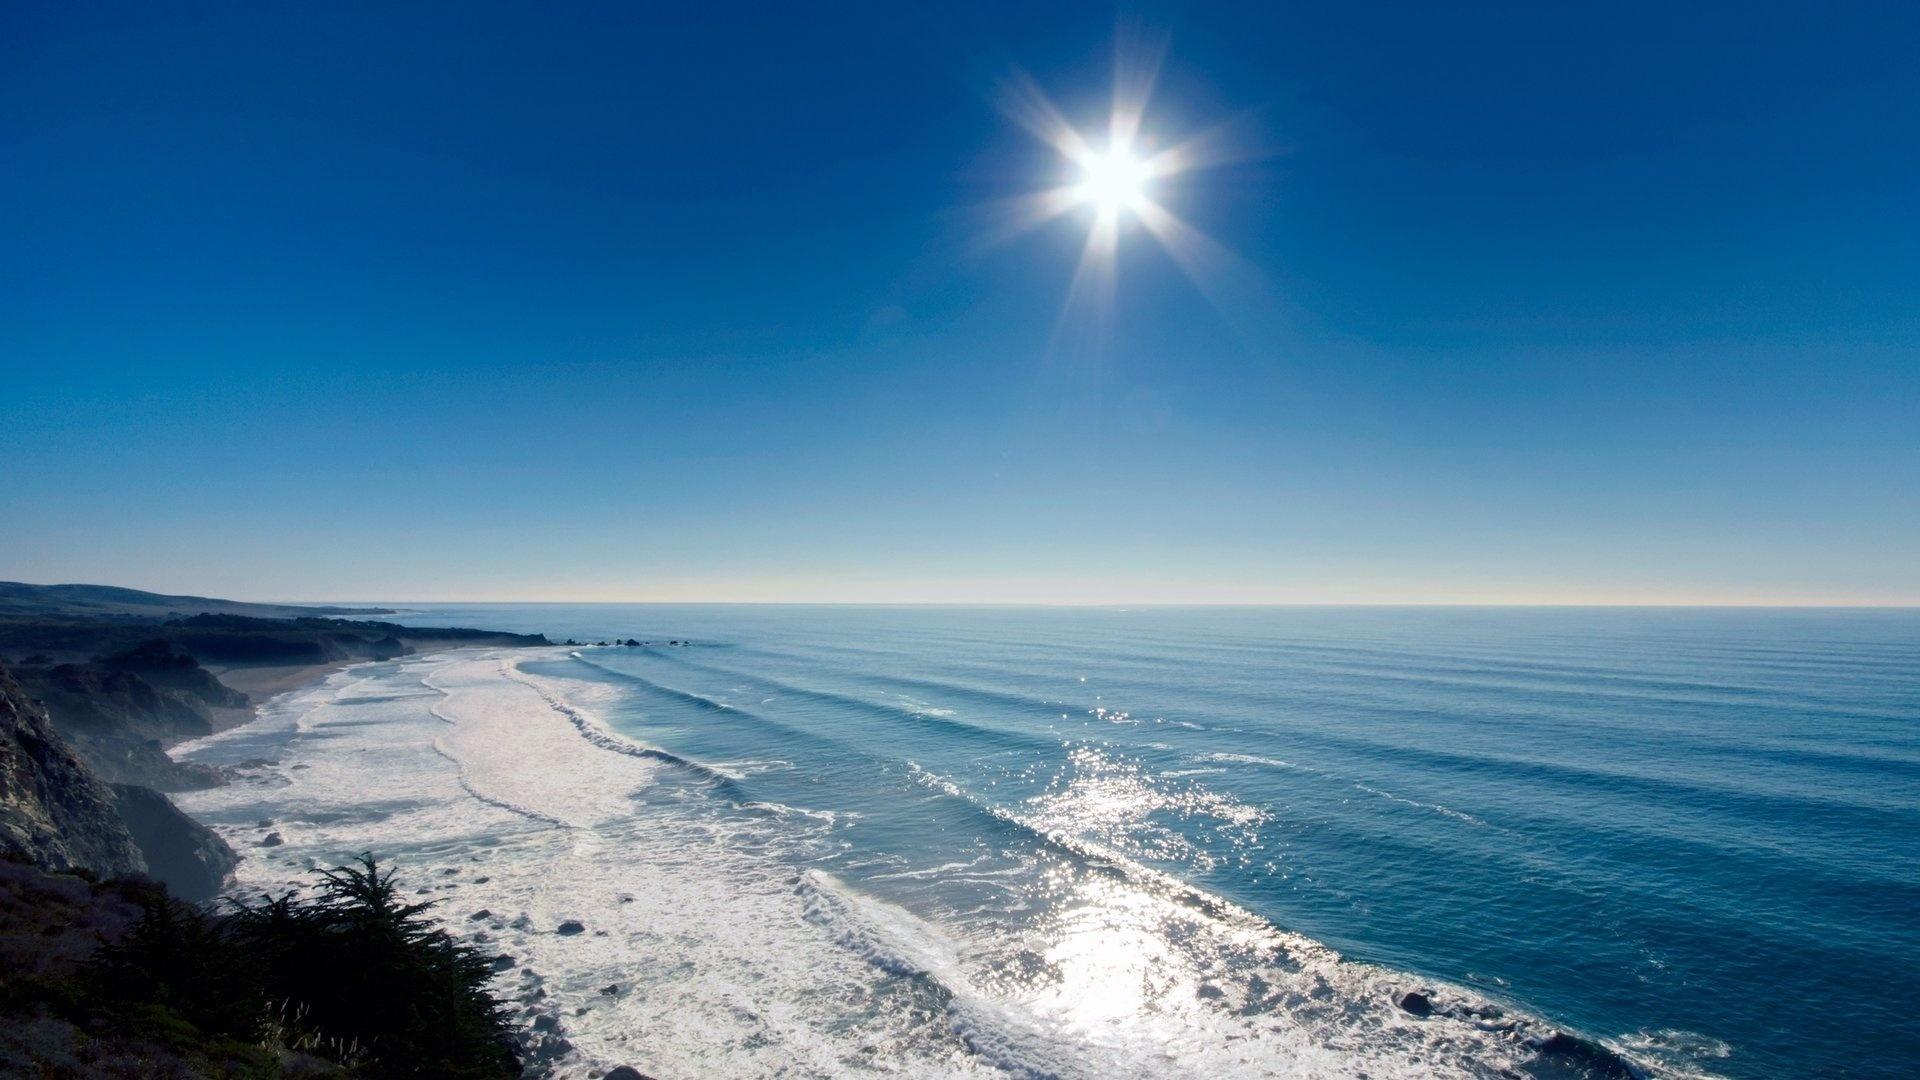 Обои океан яркое солнце чистое небо